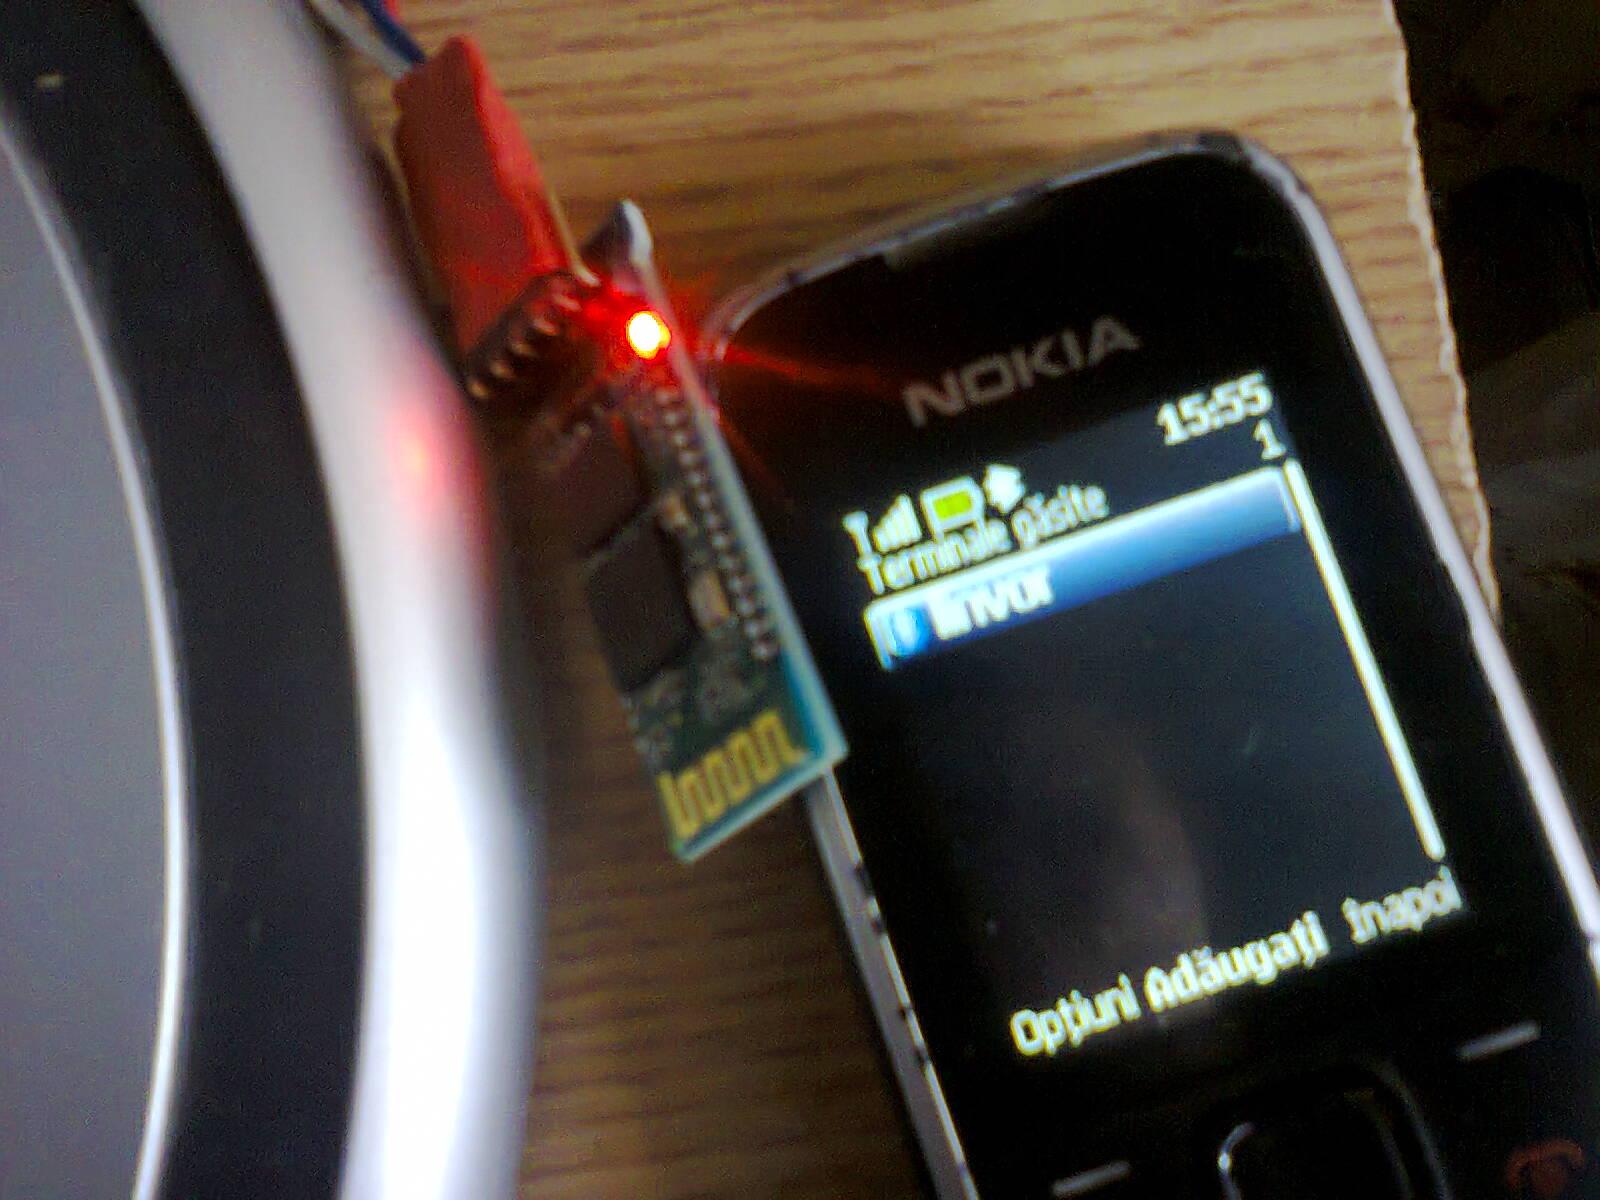 Nicu Florica Niq Ro Aprilie 2013 Circuit Pic16f628 Rf Remote Buton 433mhz Button Primul Test A Fost Acela In Care Am Alimentat Modului Cautandu L Cu Un Telefon Led Ul Rosu De Pe Modul Se Aprinde Intermitenta Cand Modulul Hc 06 Nu